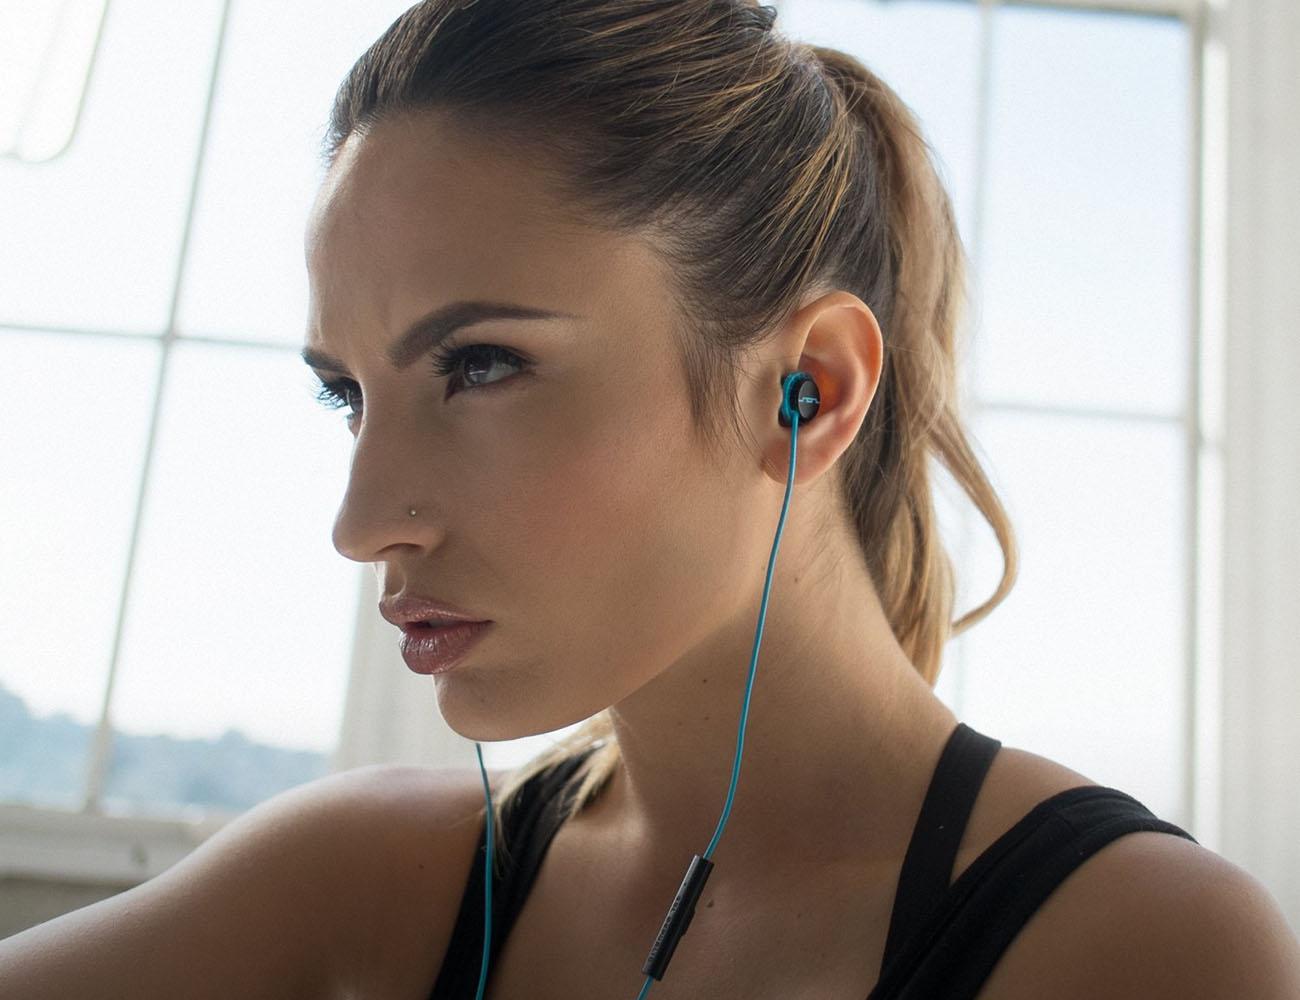 Relays Sport Wireless Headphones by SOL REPUBLIC